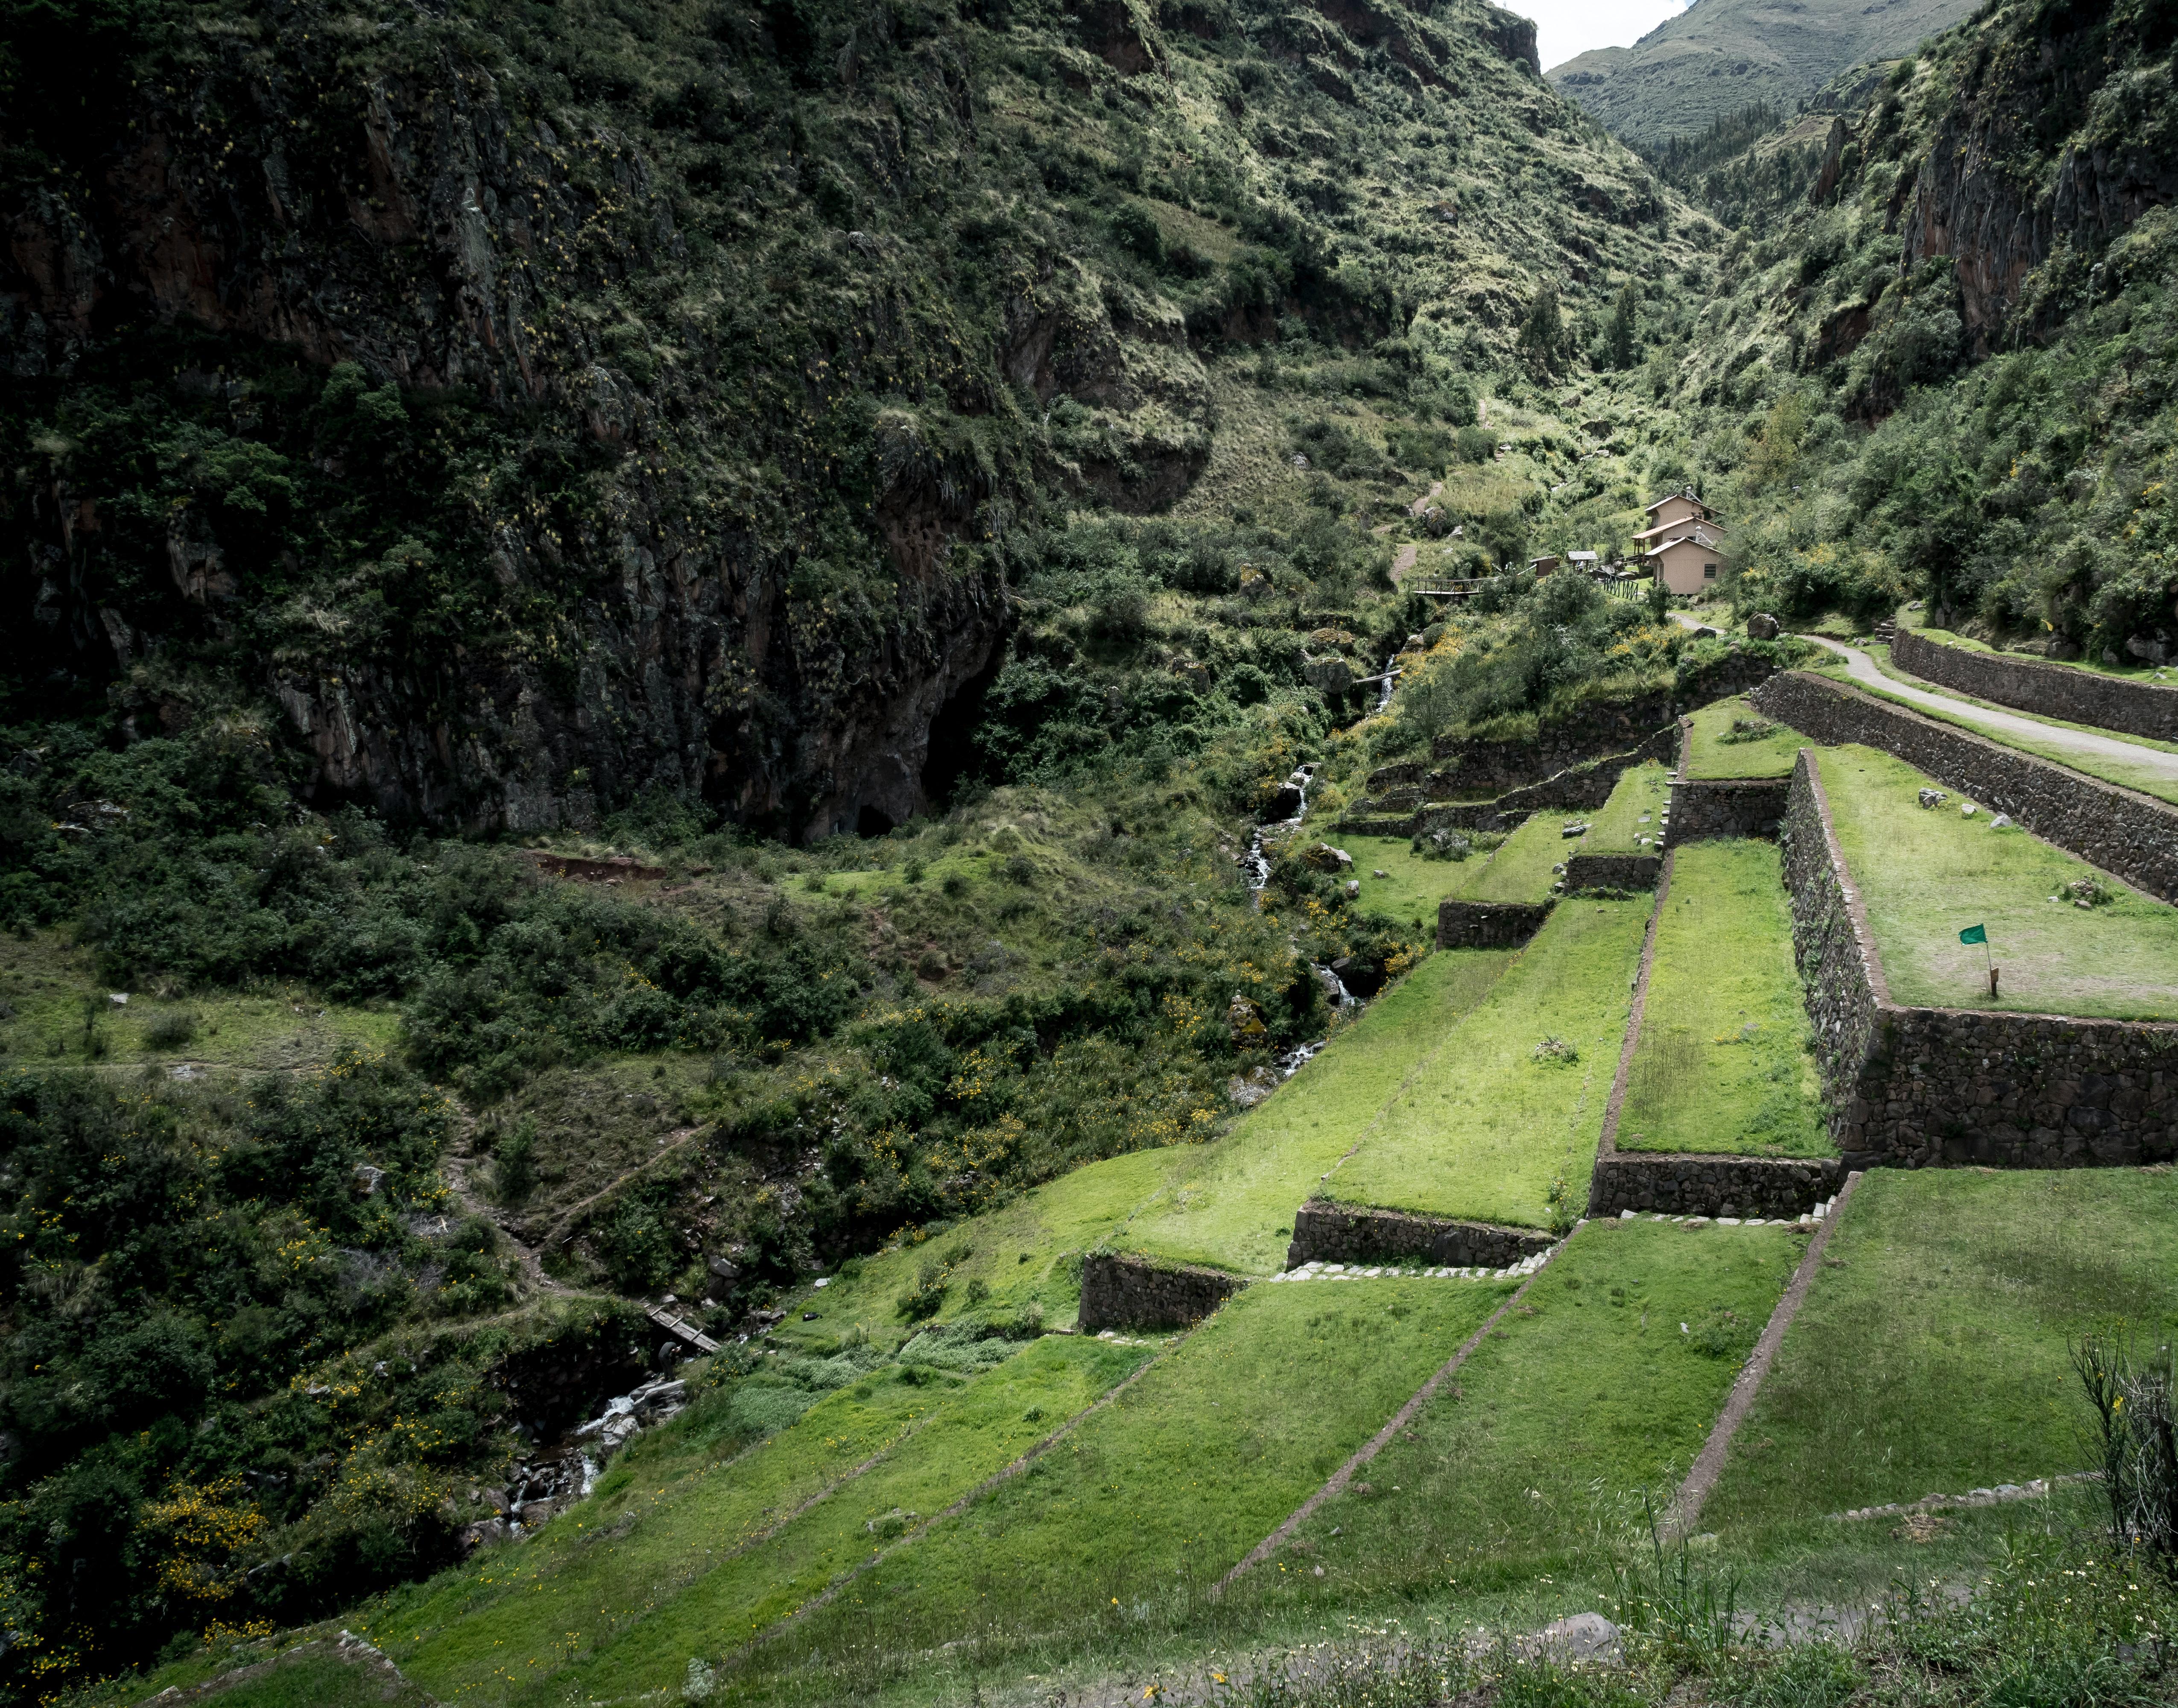 agriculture terraces